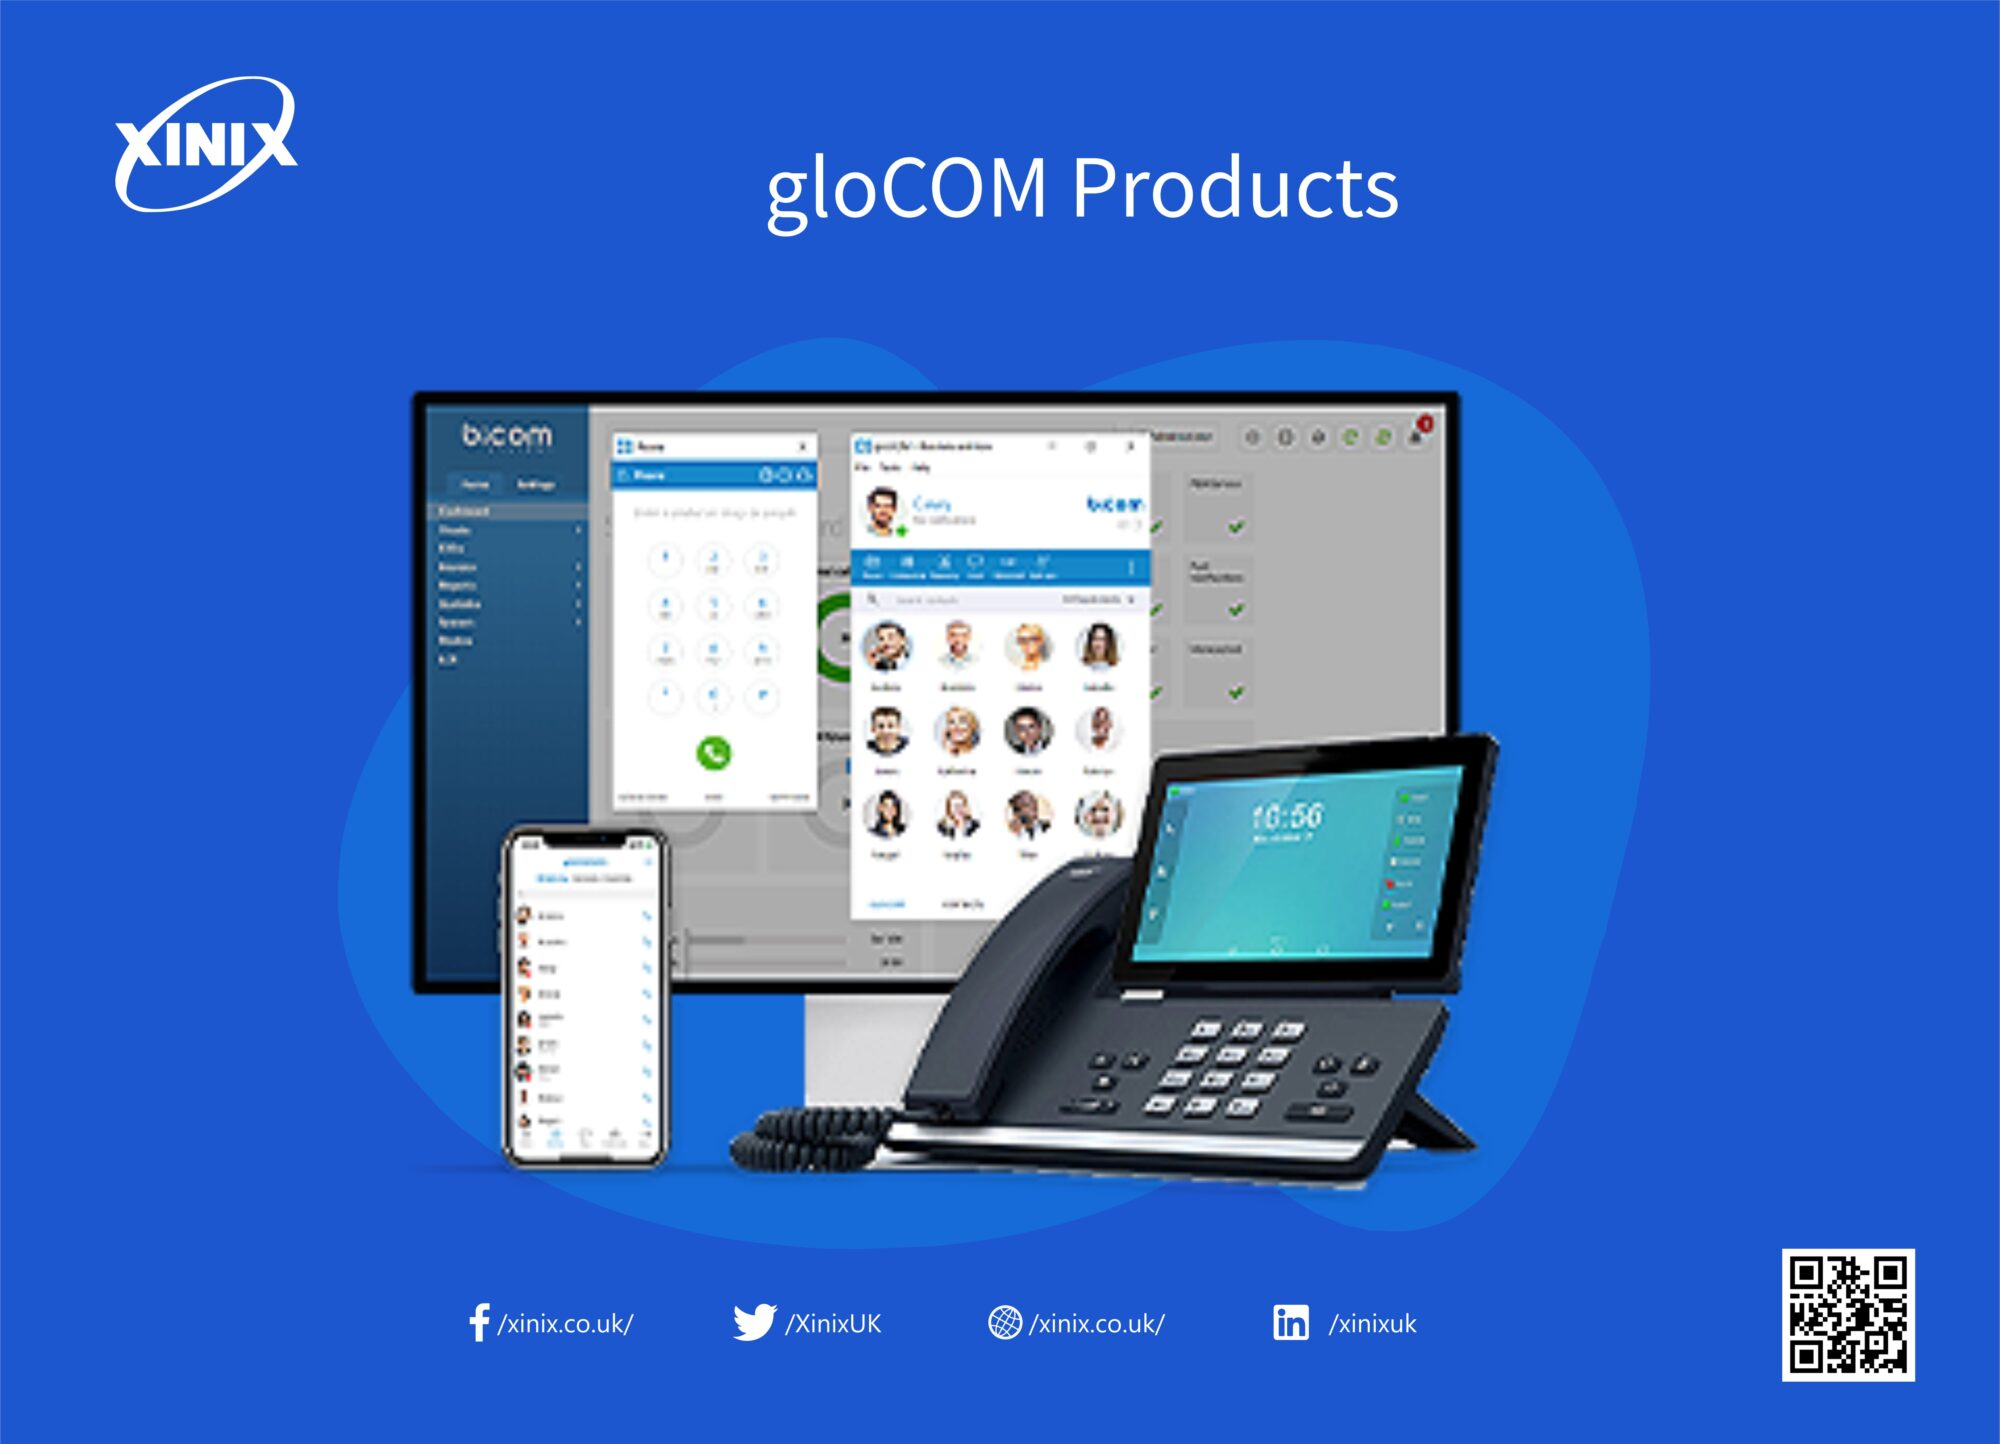 gloCOM Products